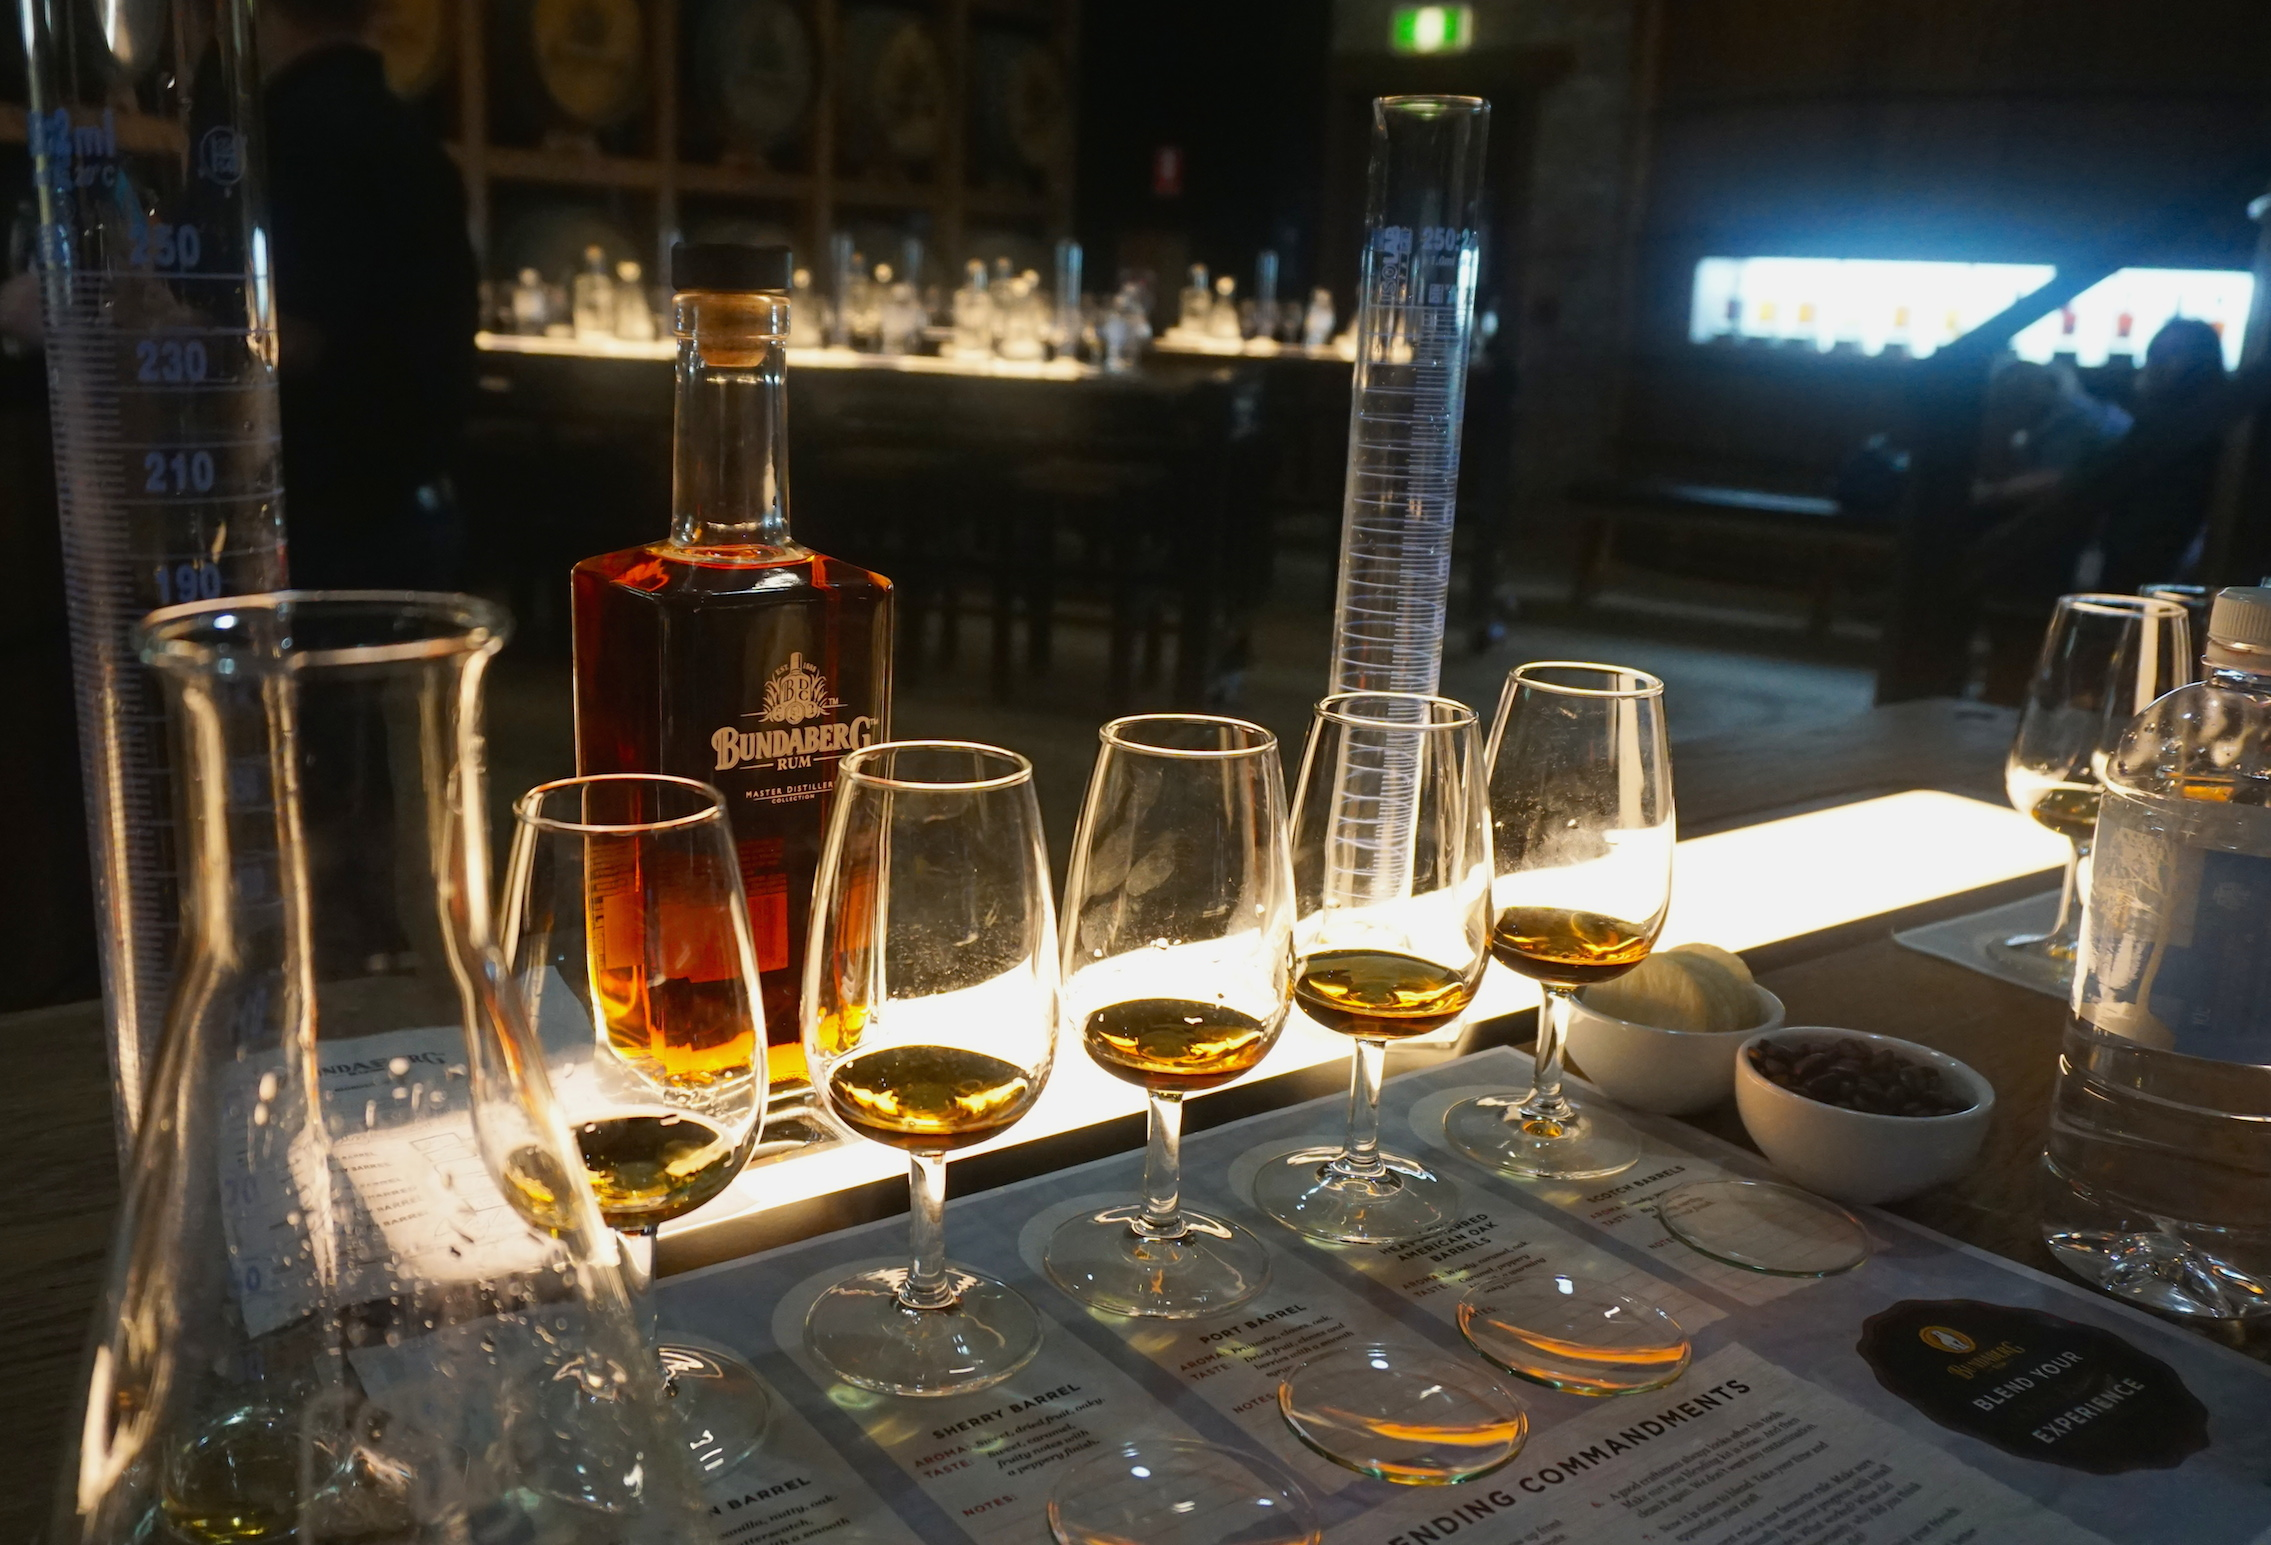 Bundaberg Rum Blend Your Own Rum This Magnificent Life